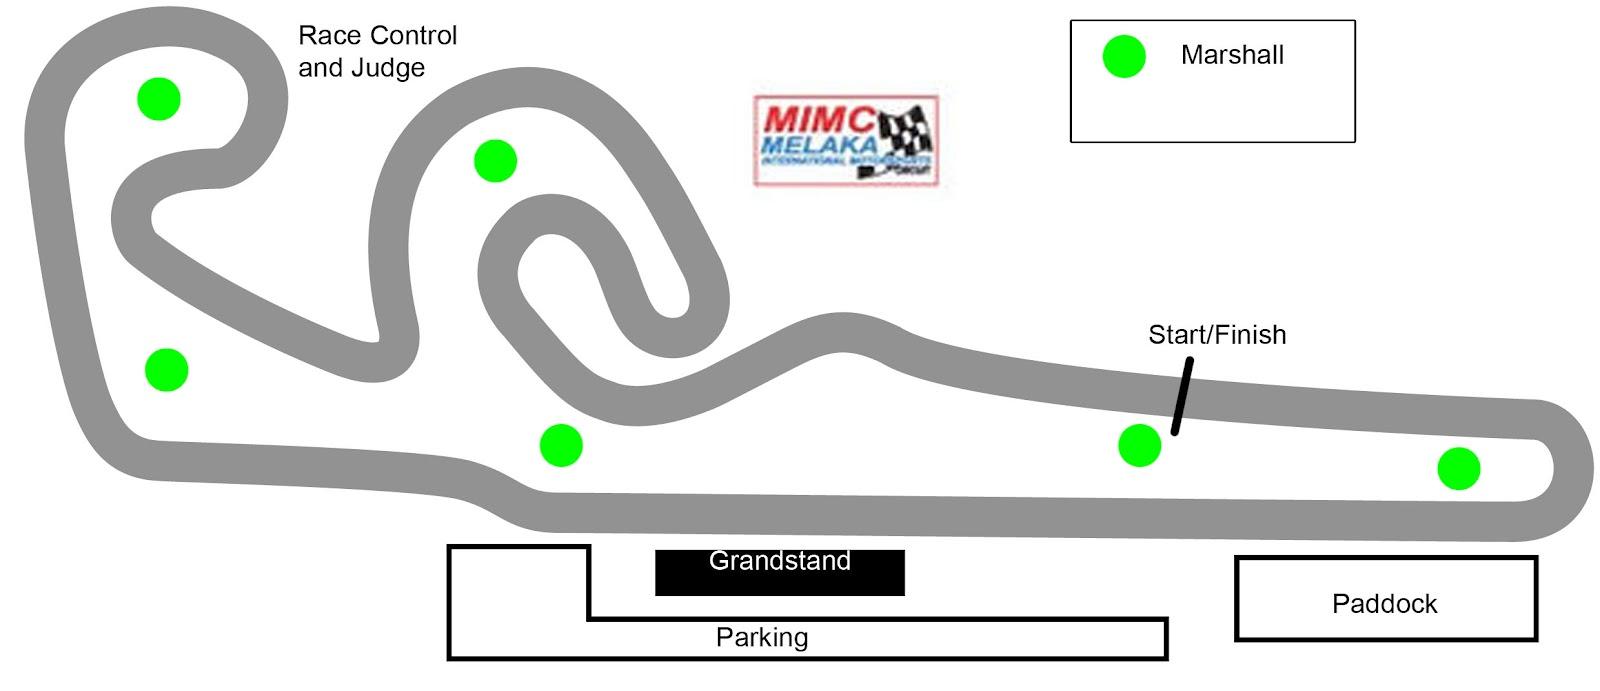 melaka international motorsport circuit